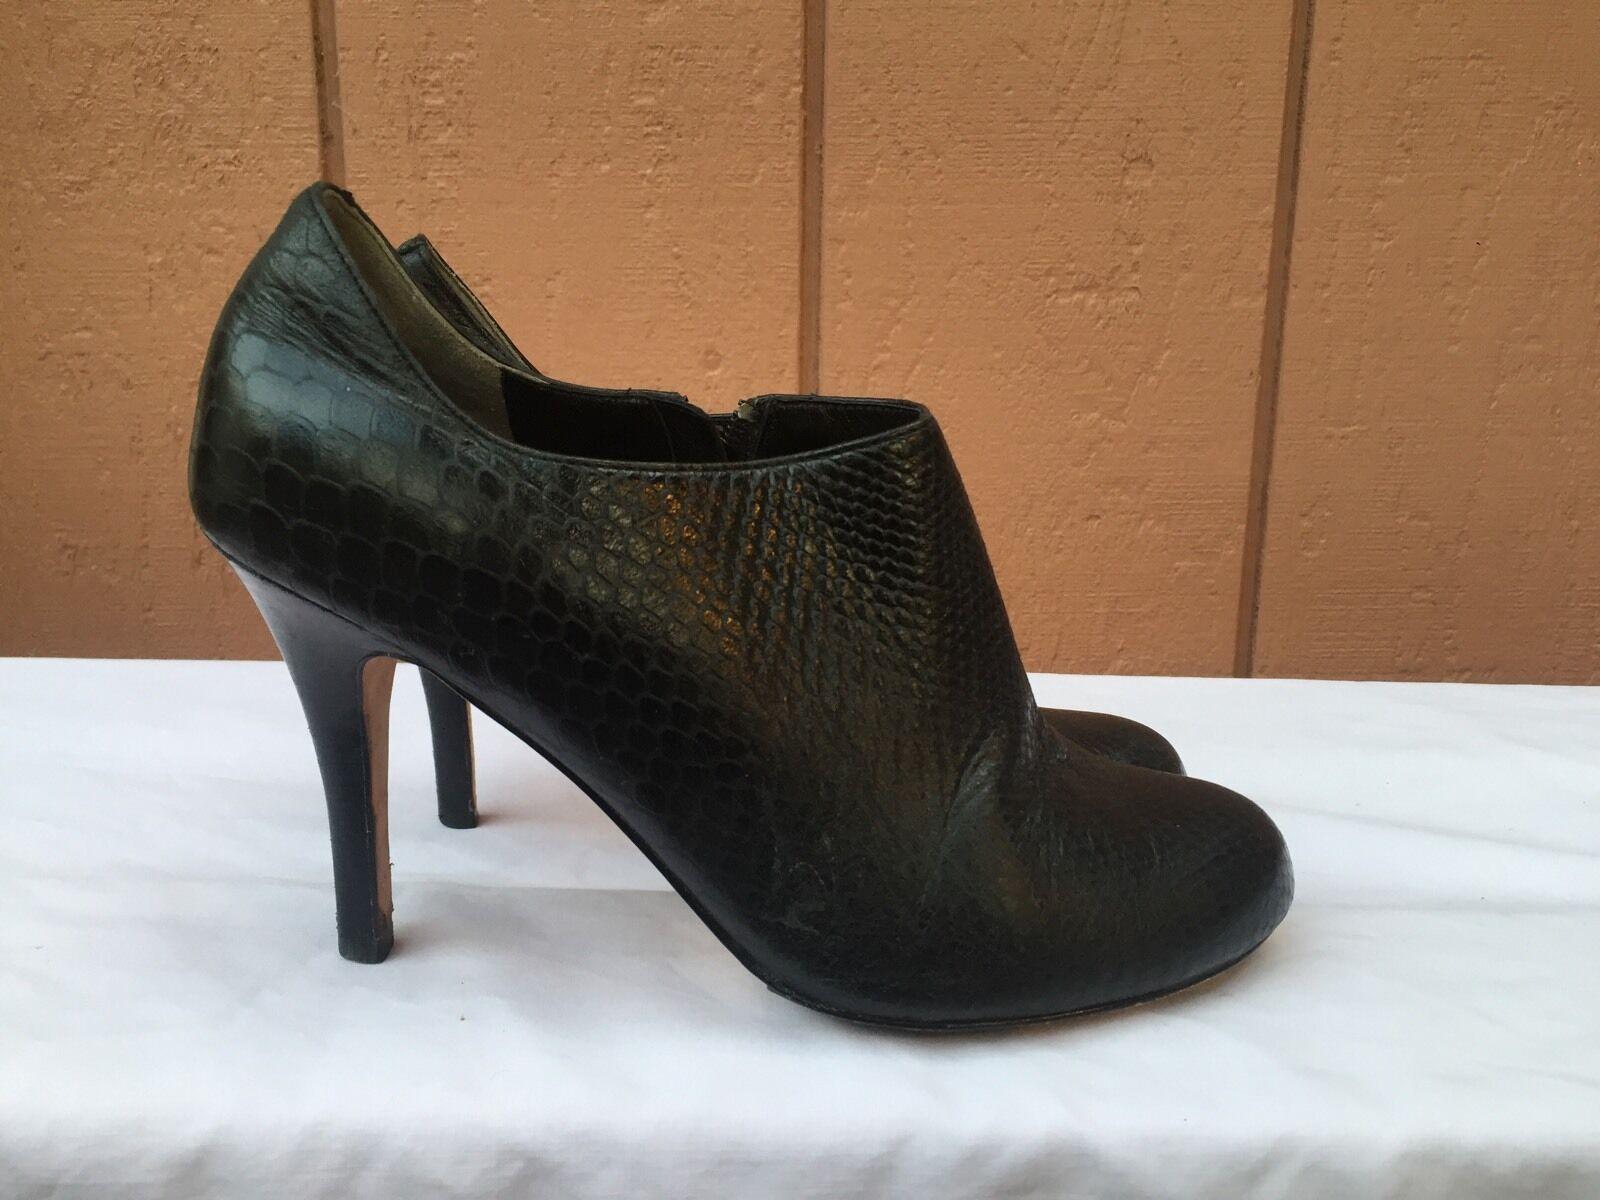 EUC Cole Haan Black High Heel Black leather Booties Womens Shoes US Sz 8 B